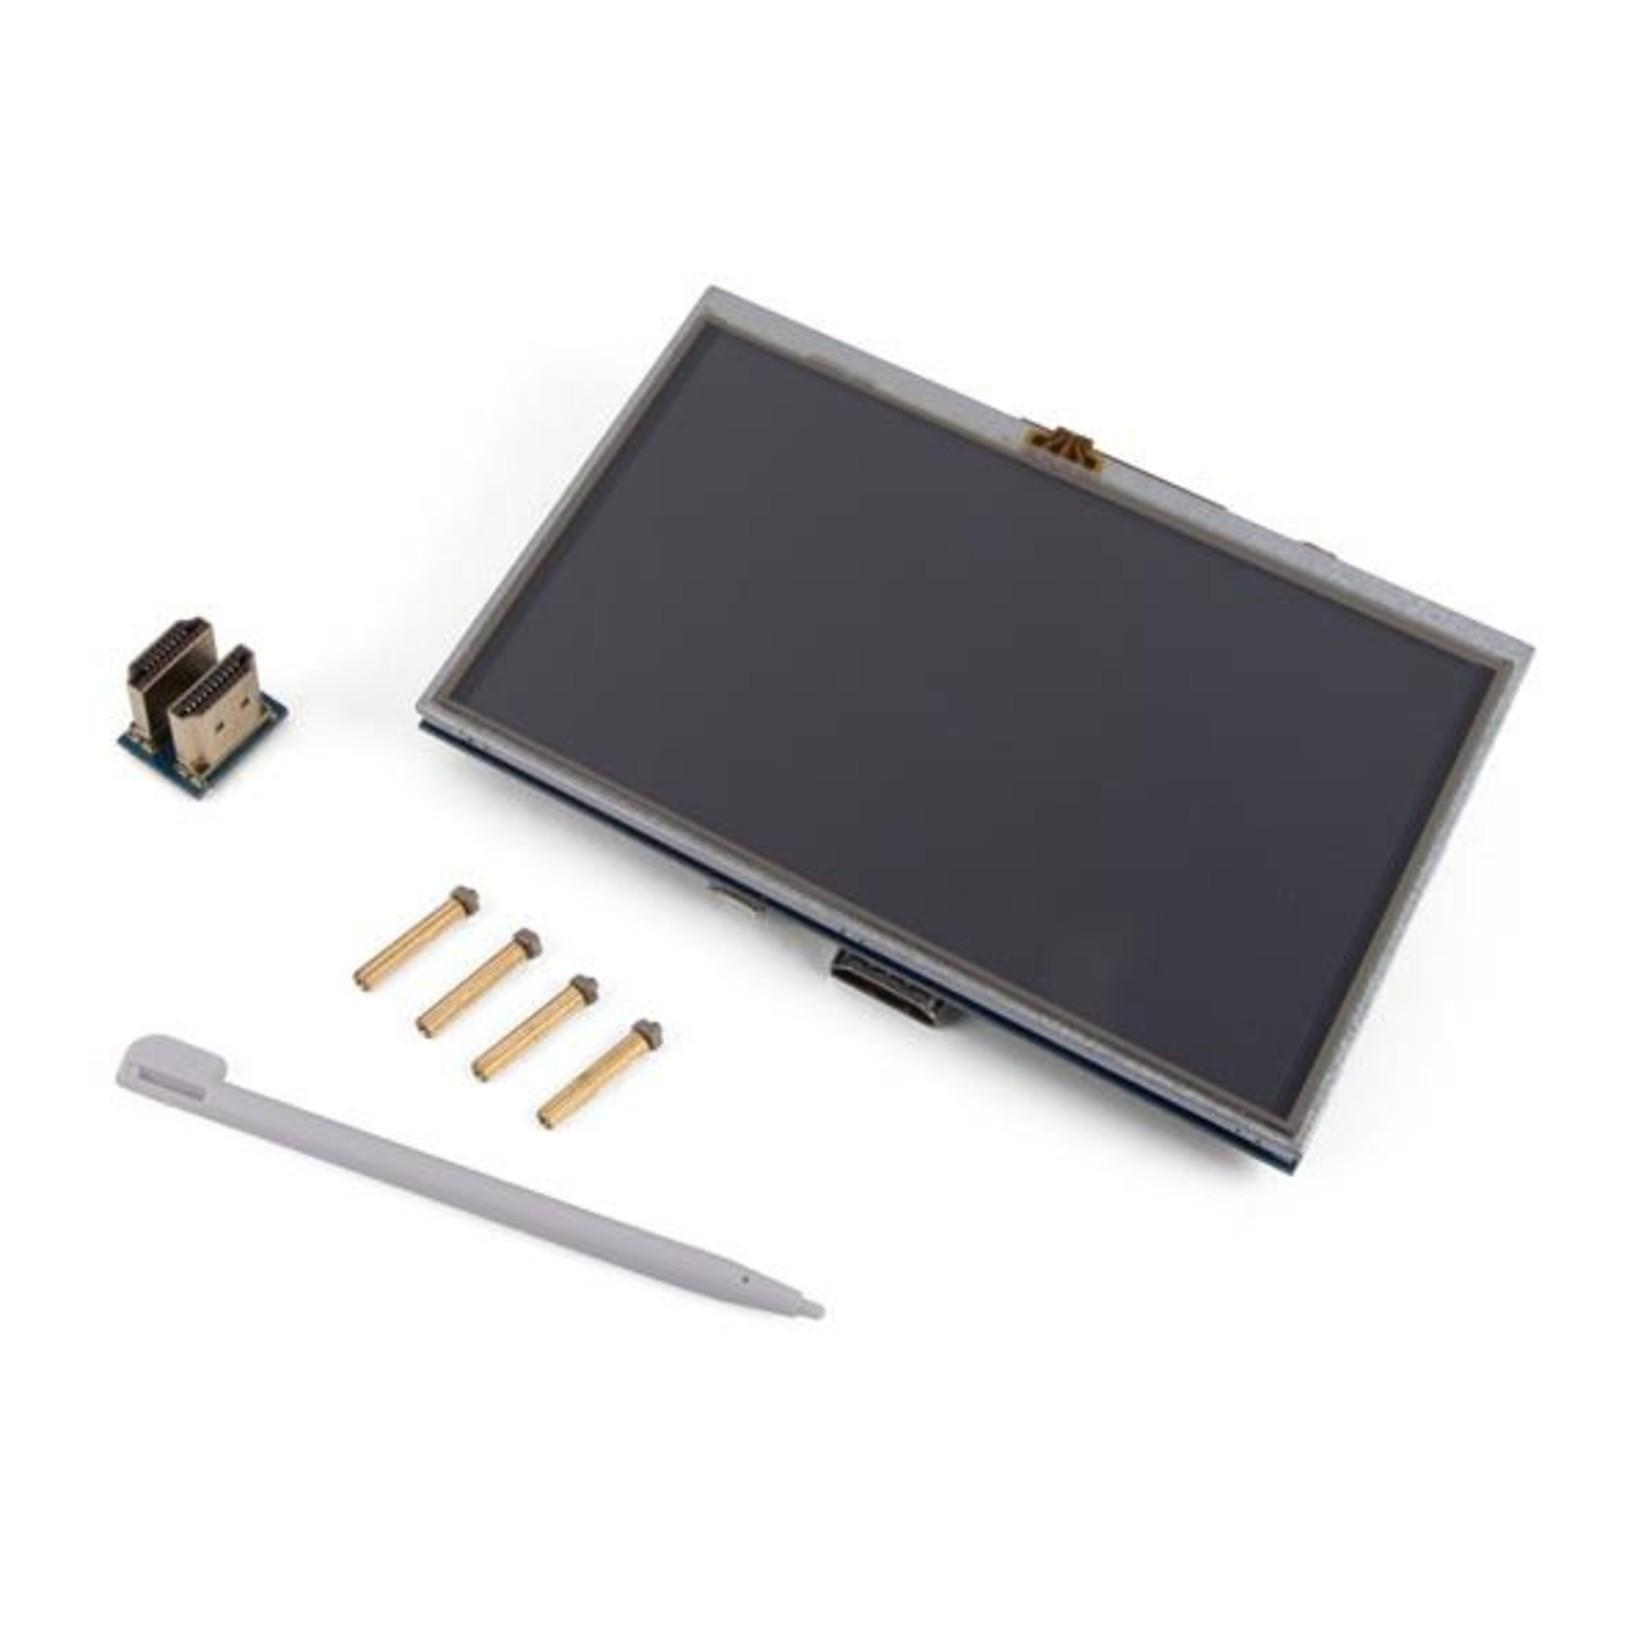 "Velleman HDMI-B Touchscreen voor Raspberry PI® - 5"" - 800 x 480"